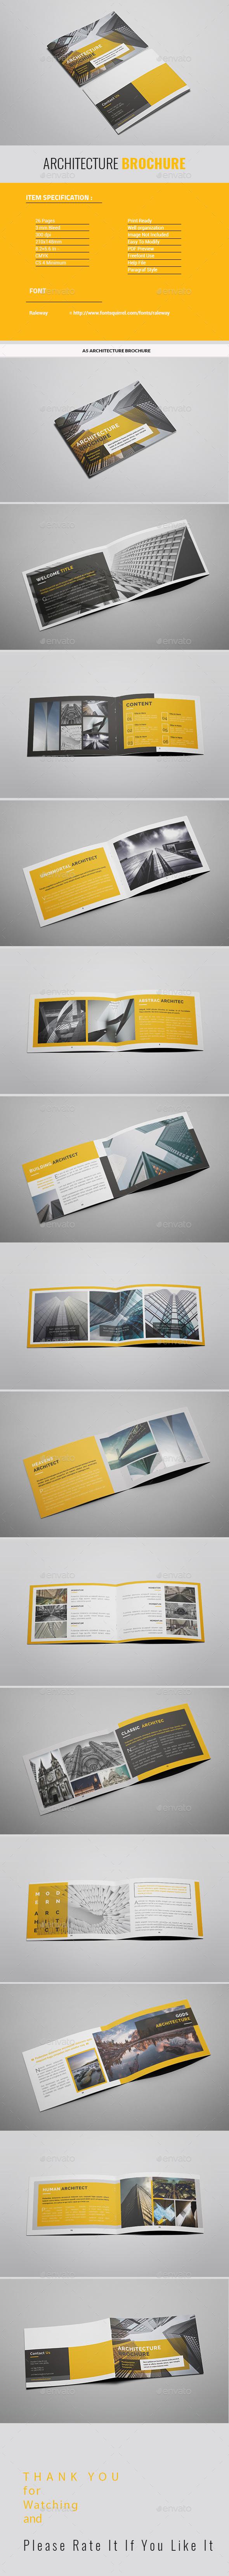 A5 Yellow Architecture Brochure - Portfolio Brochures